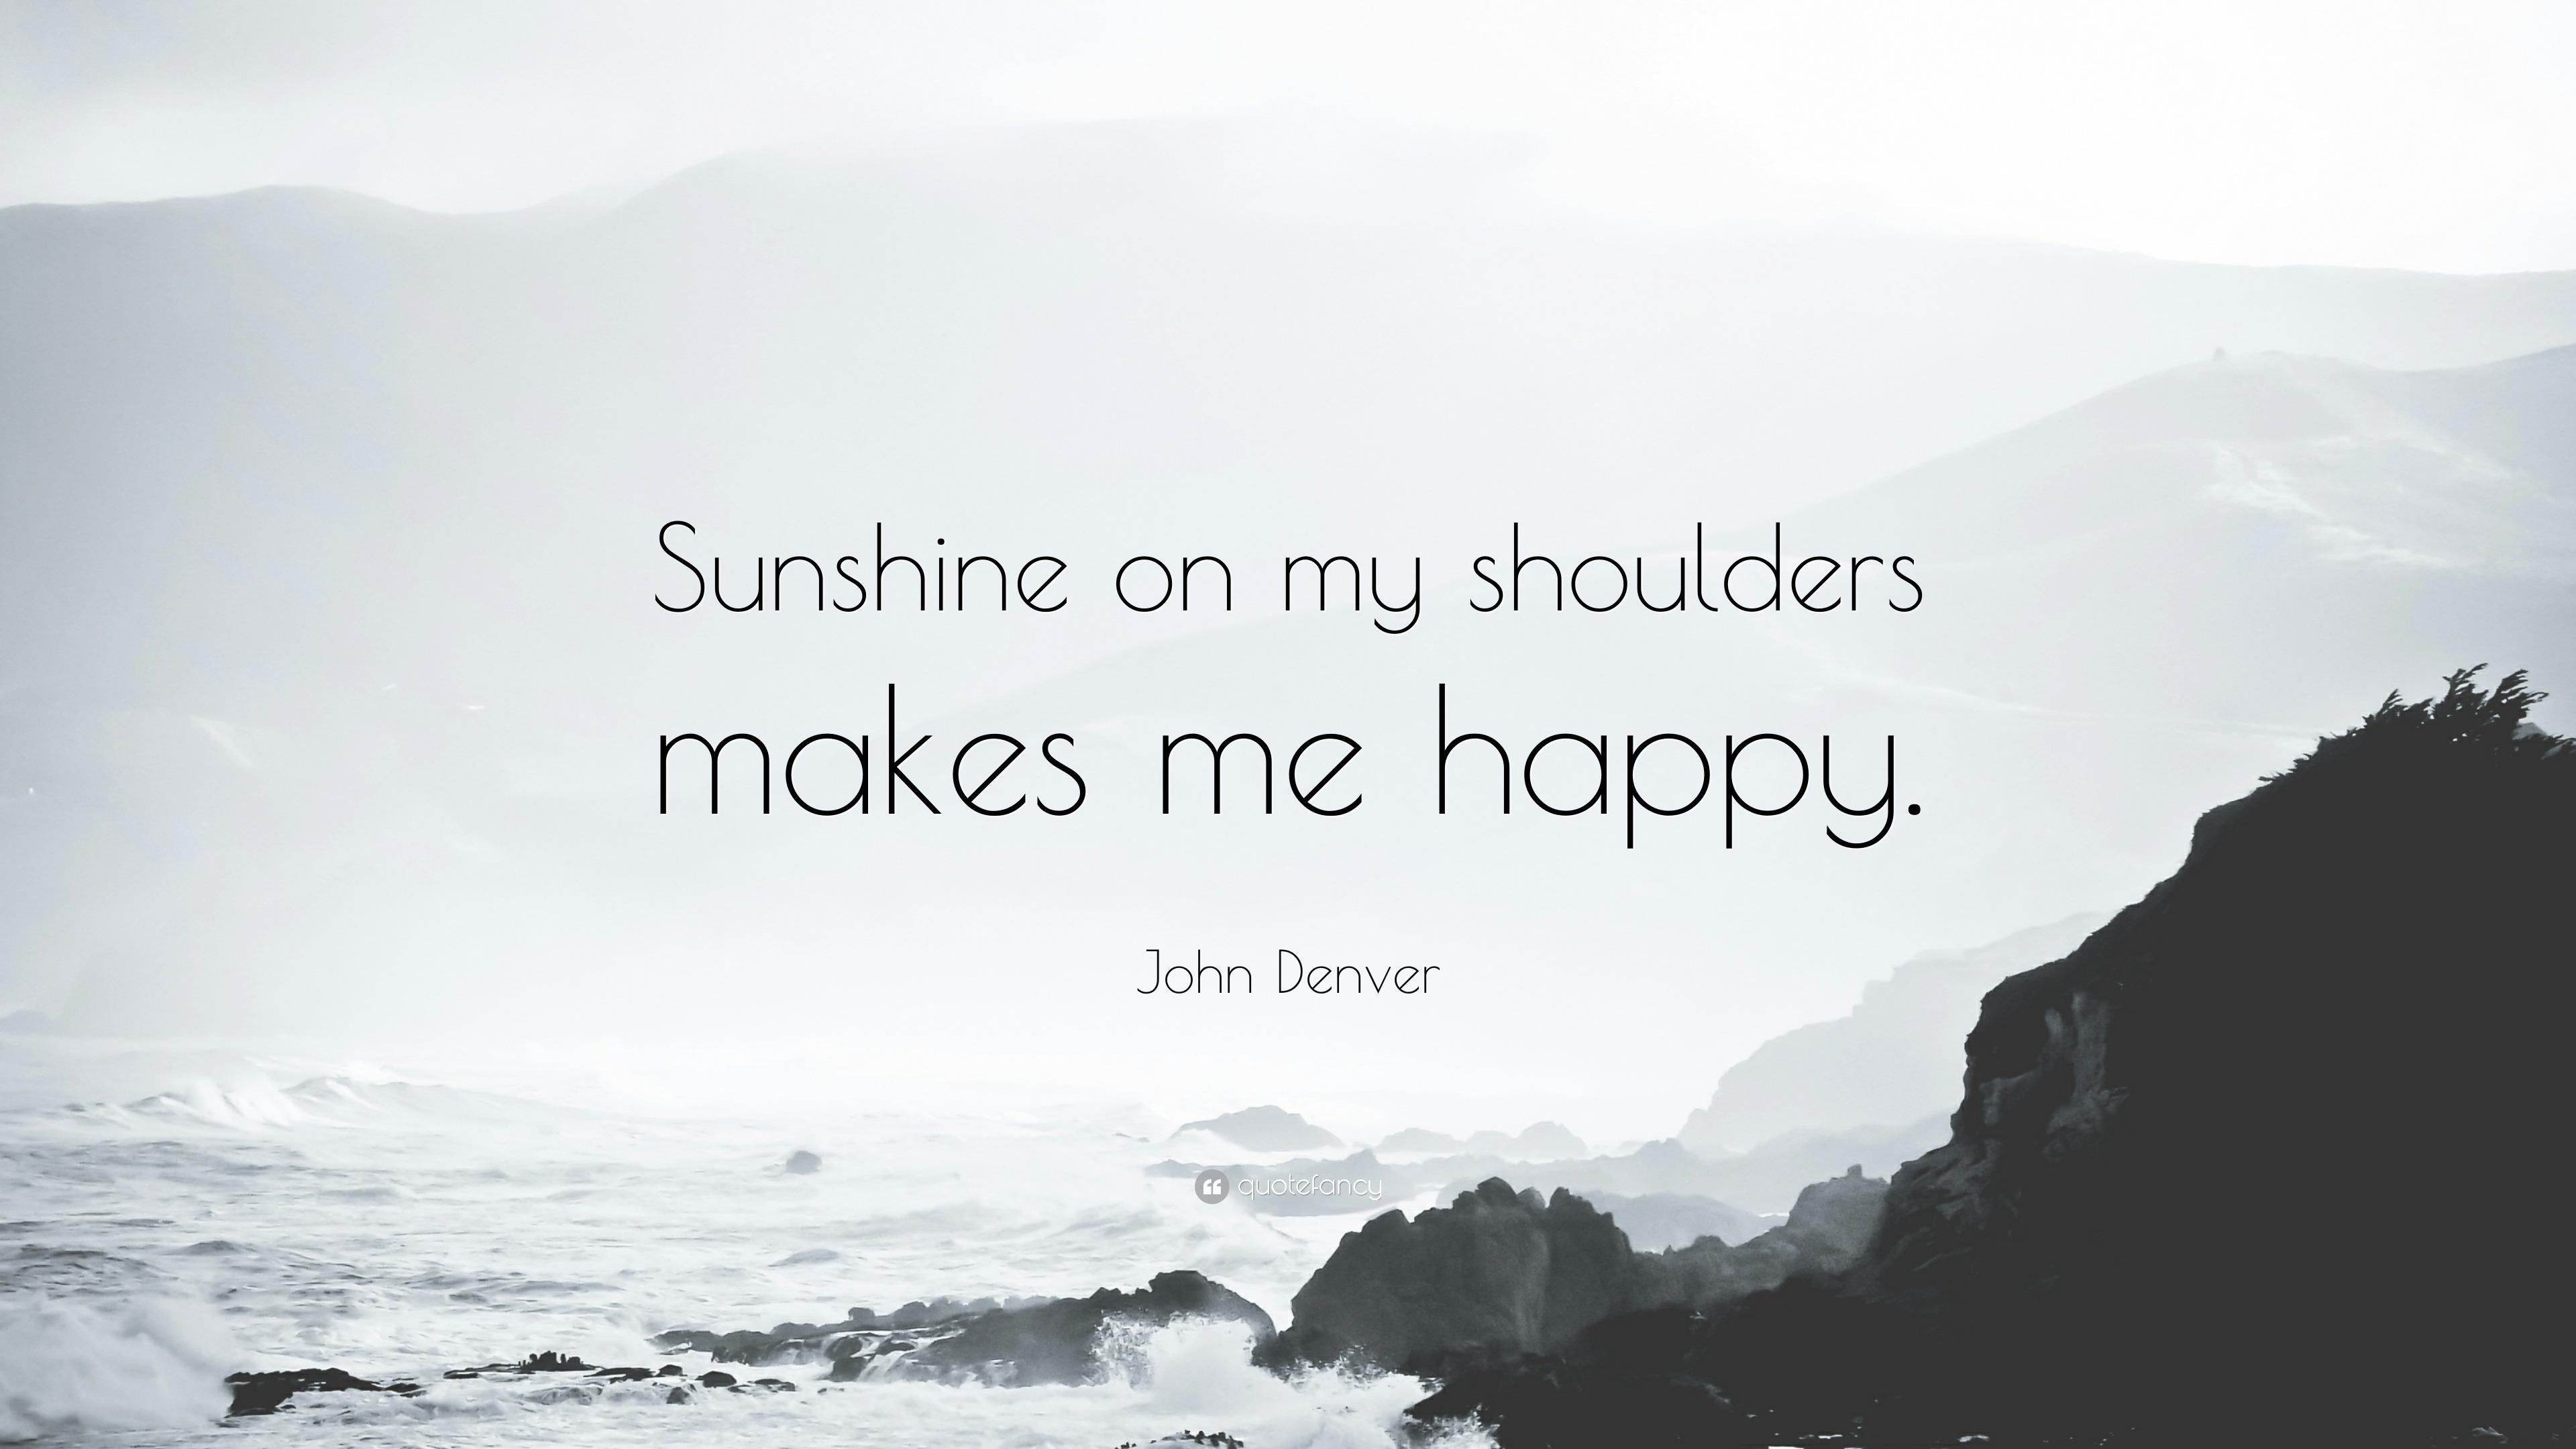 John Denver Quote Sunshine On My Shoulders Makes Me Happy 10